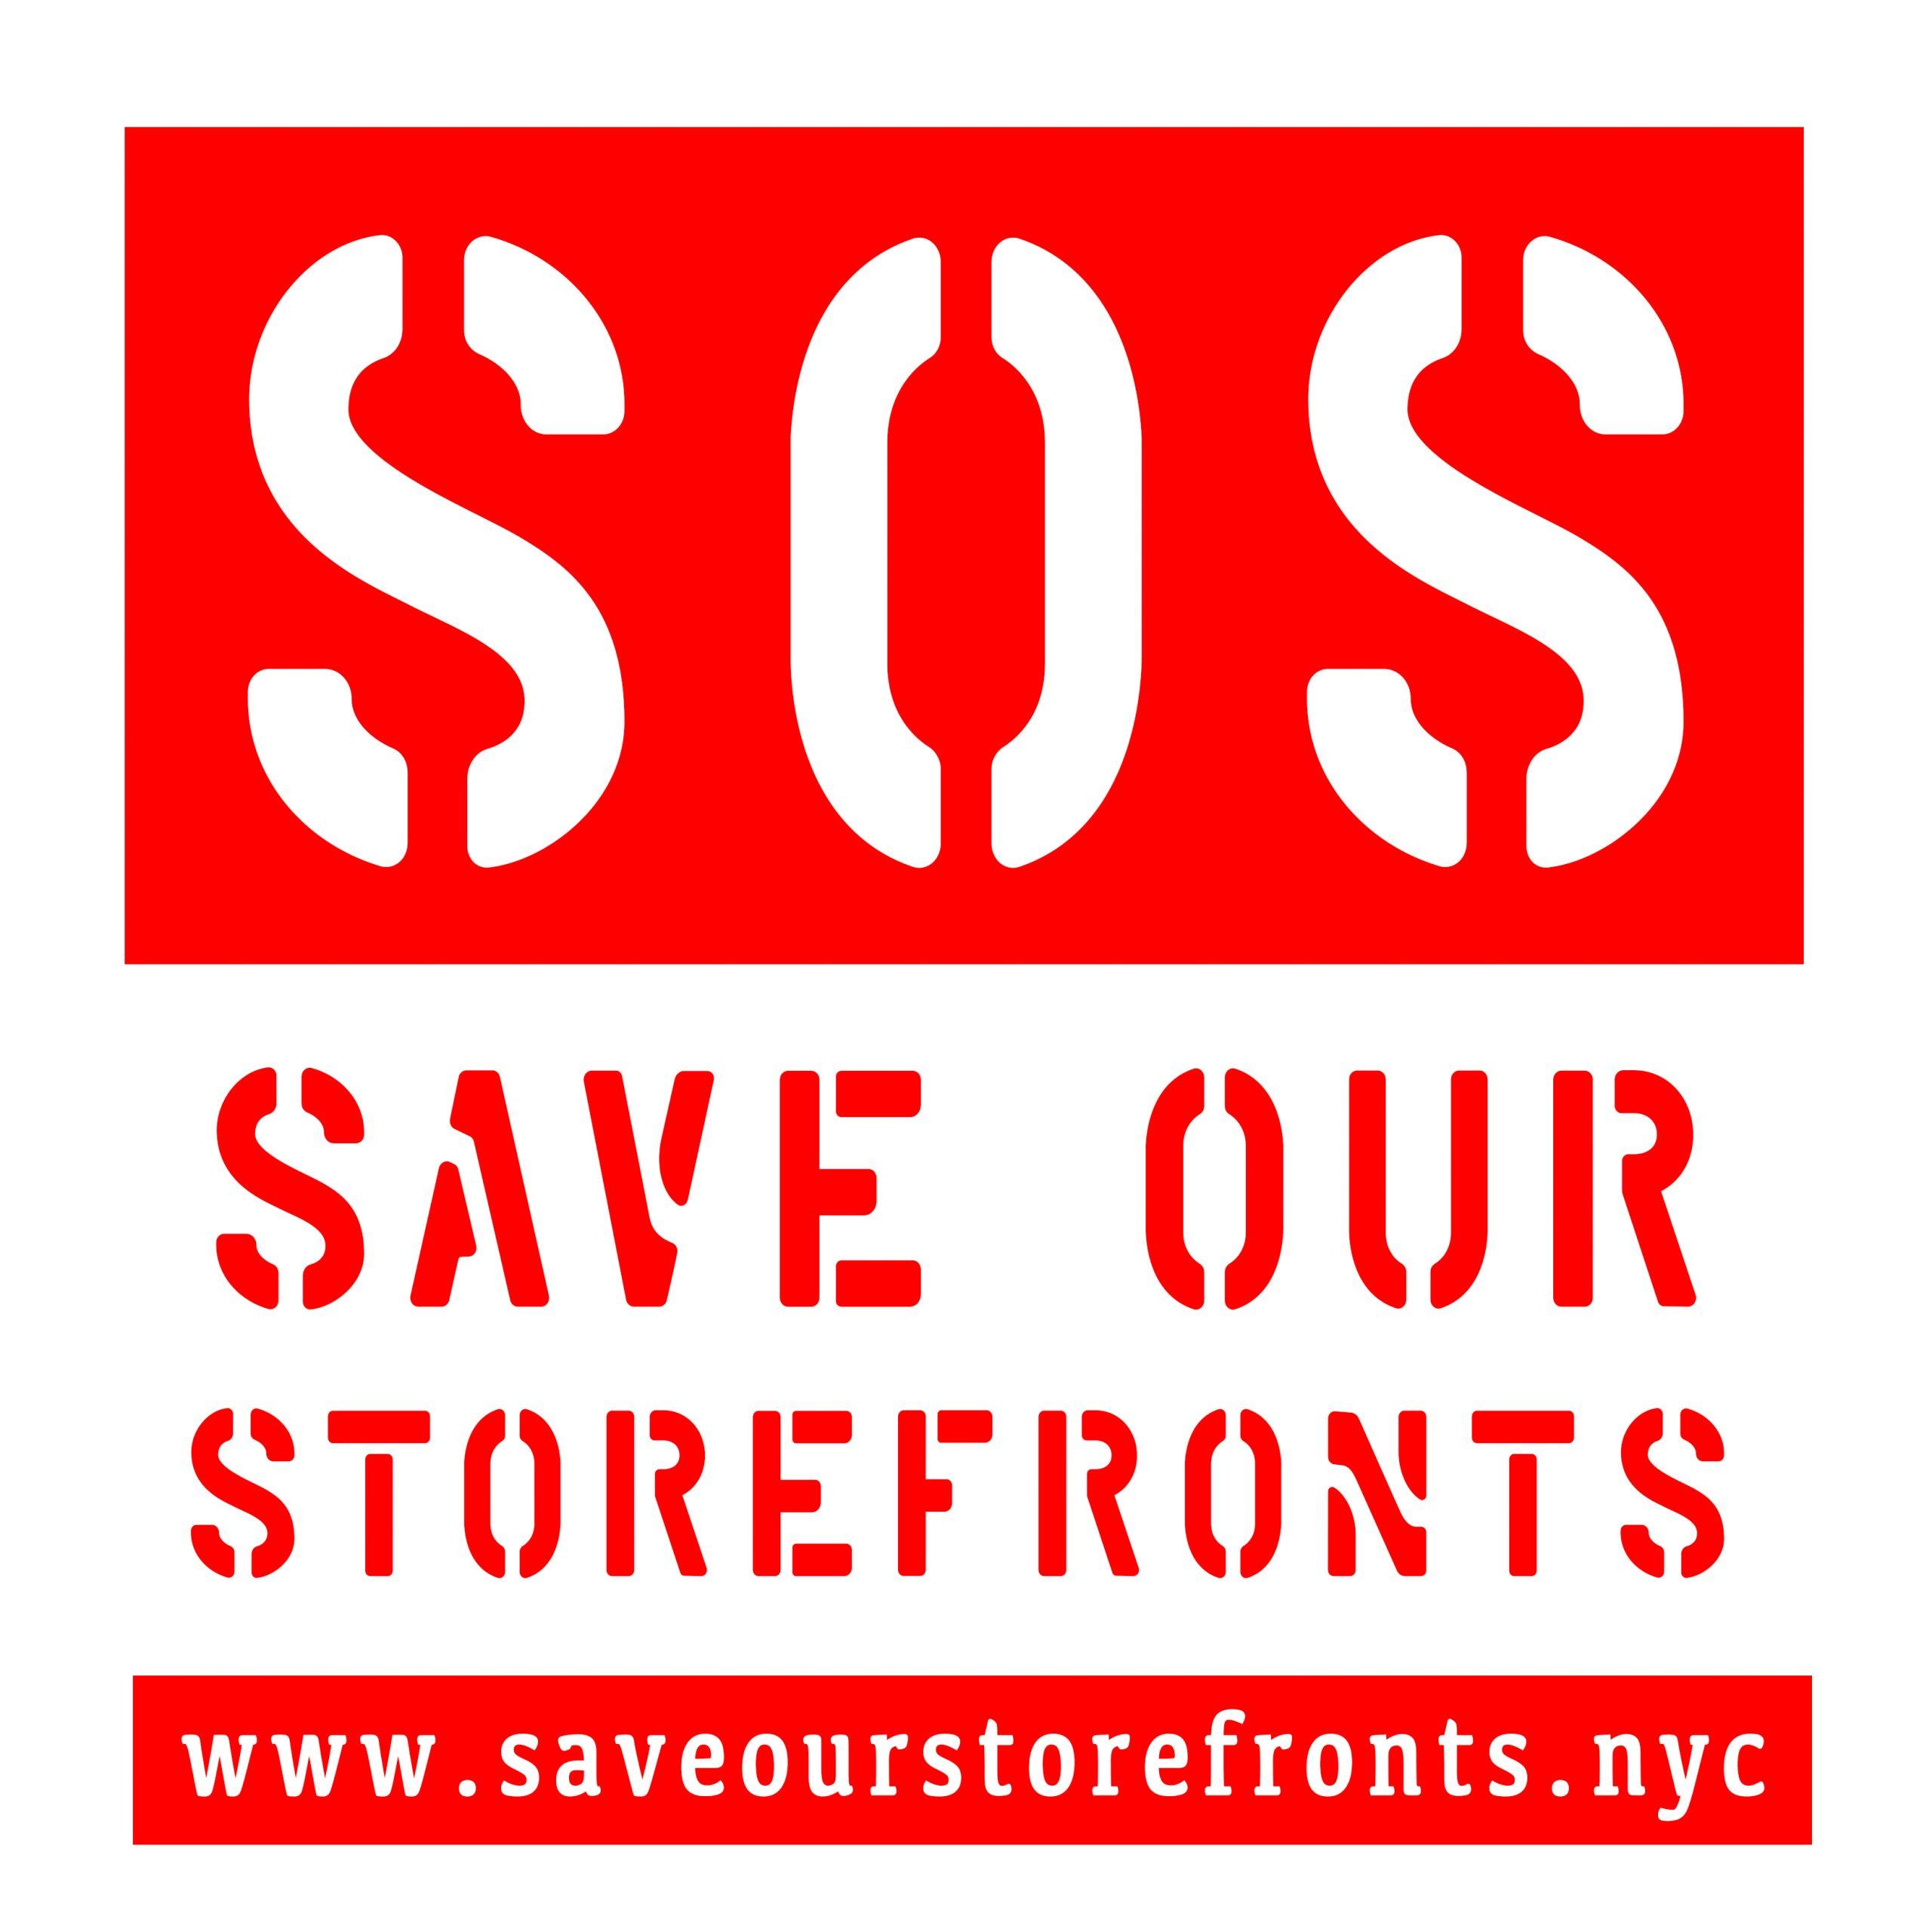 Saveourstorefronts